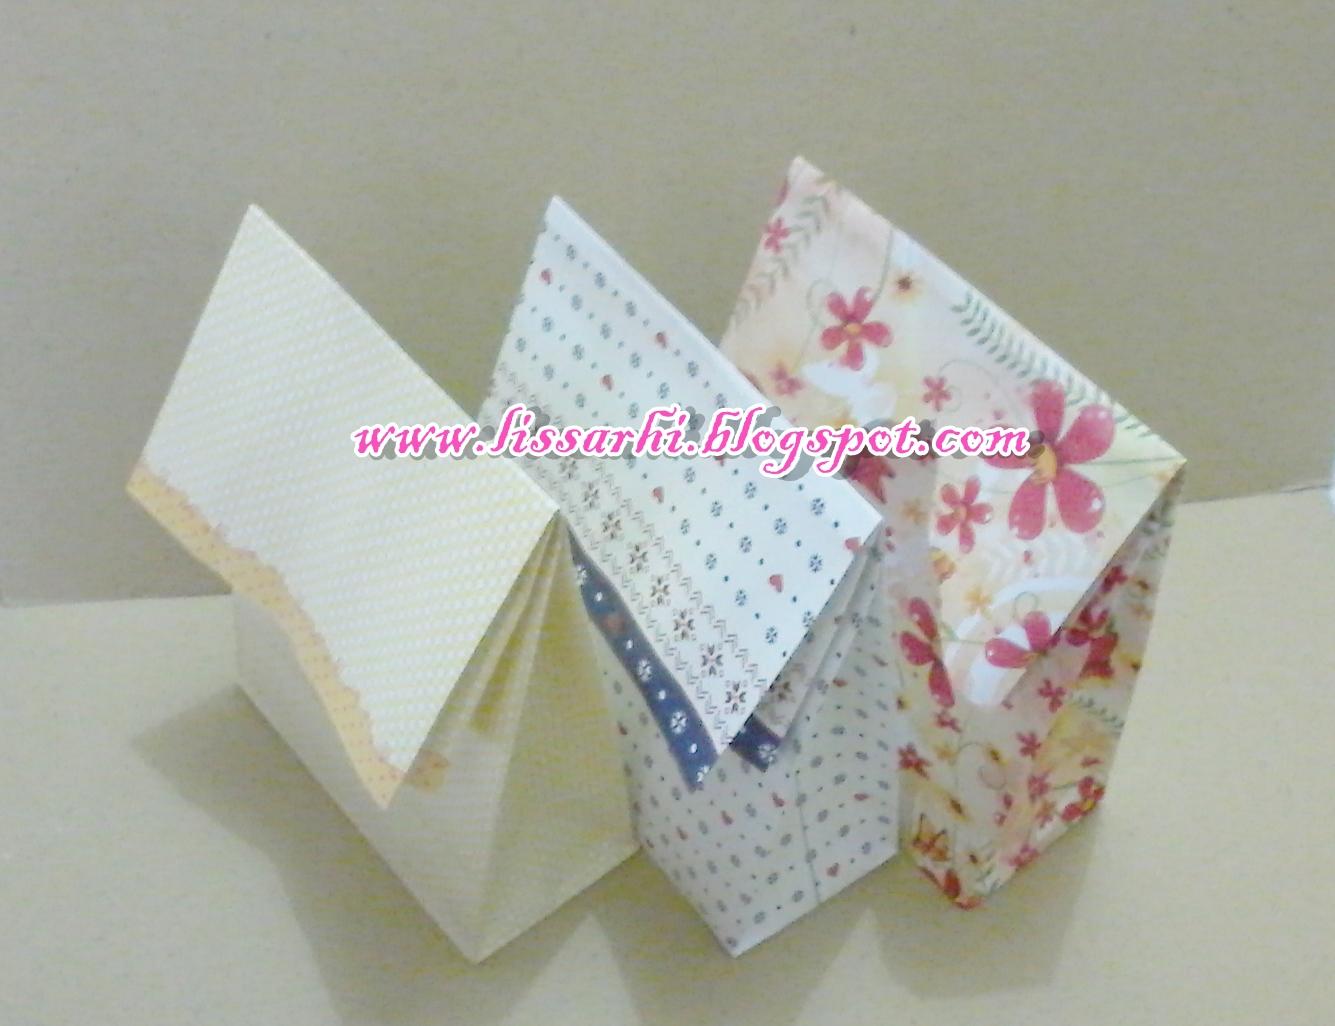 Lissa RHI  Cara Membungkus Kado Bentuk Tas (Membuat Paper Bag) ec2f1bdcdf